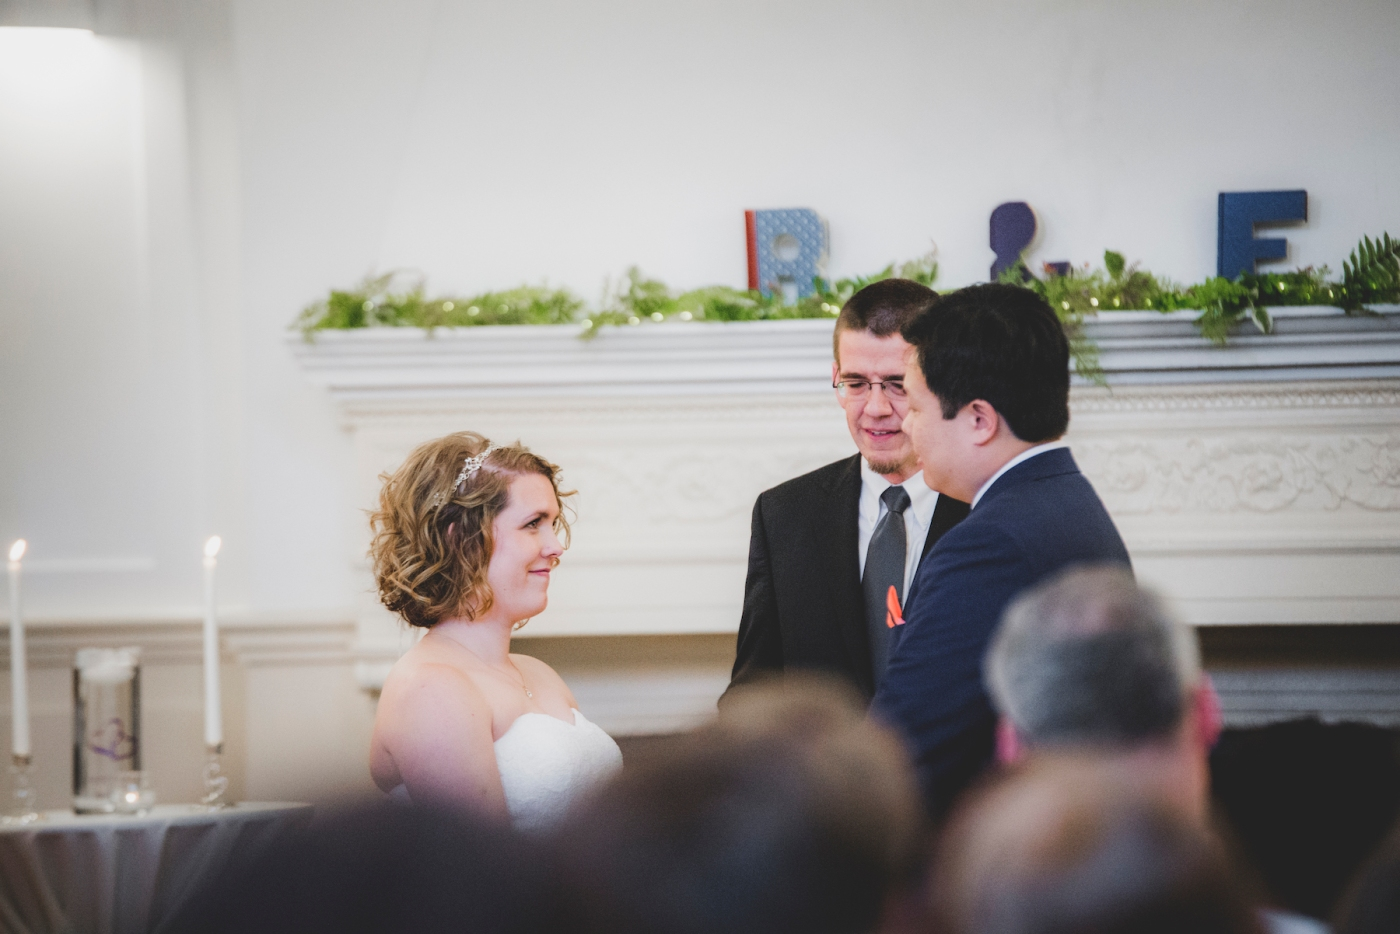 DSC_2580Everett_Wedding_Ballroom_Jane_Speleers_photography_Rachel_and_Edmund_Ceremony_2017